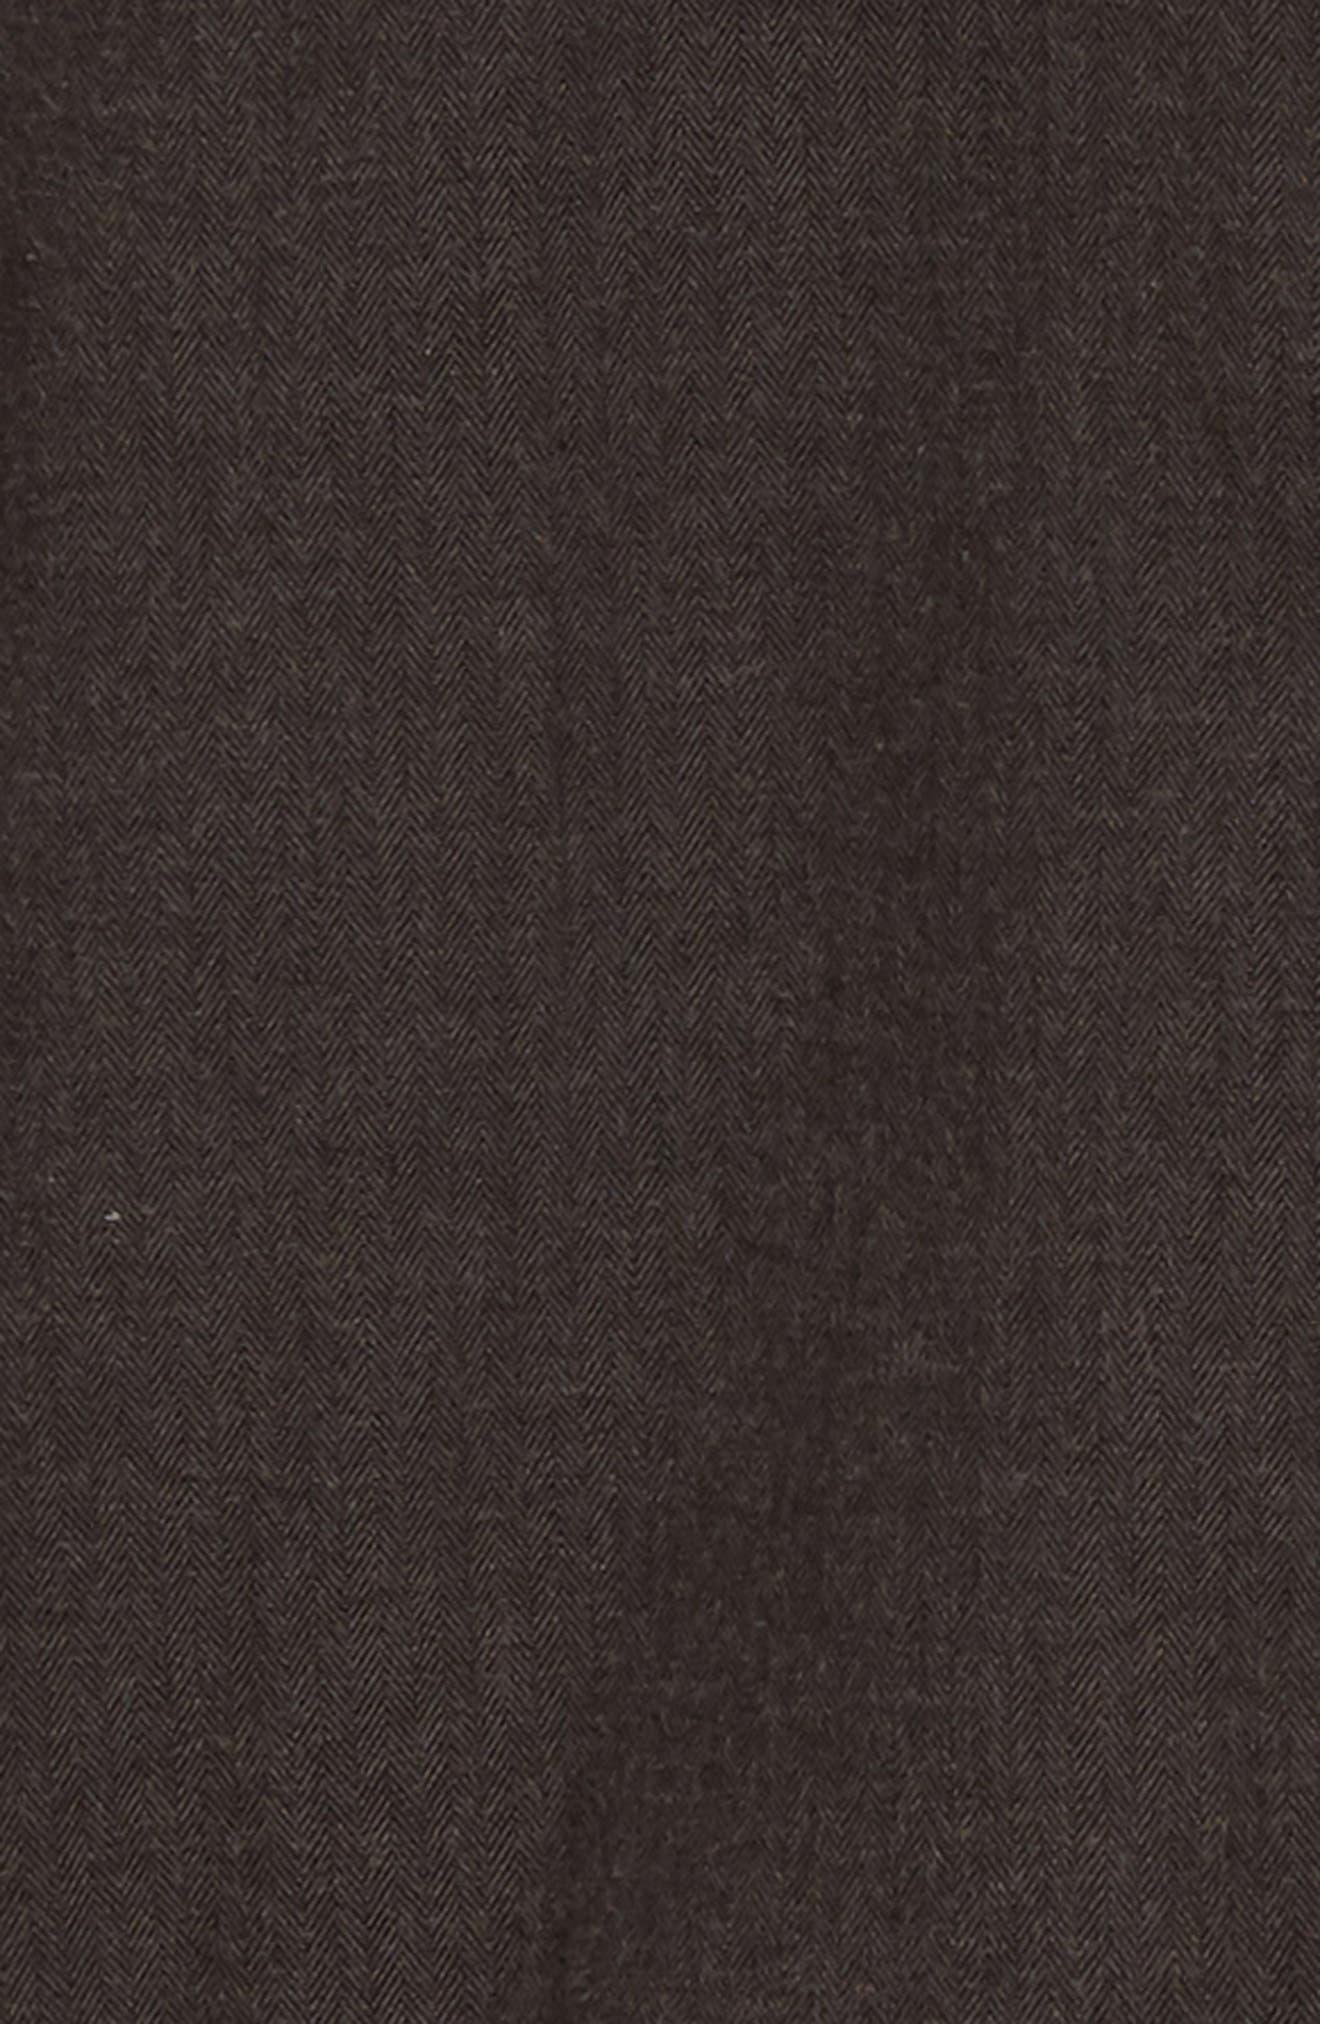 Lybek Regular Fit Herringbone Flannel Shirt,                             Alternate thumbnail 6, color,                             SCORCHED BROWN HERRINGBONE